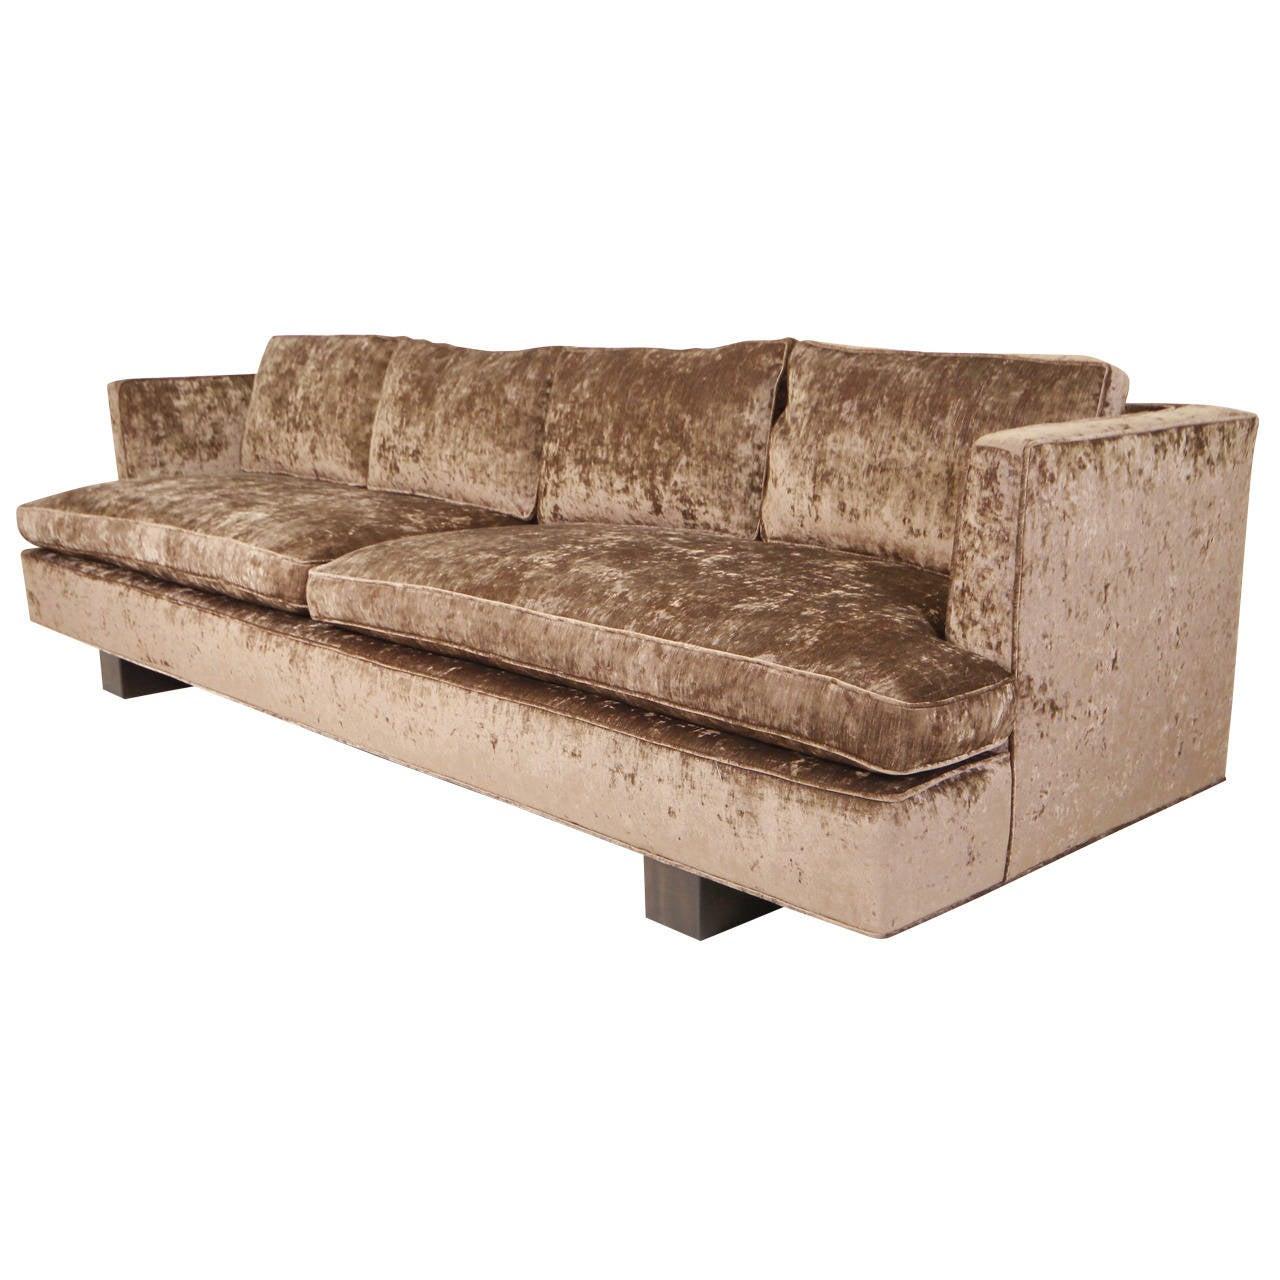 Mid Century Modern Velvet Sofa in the Manner of Edward  : 2111222l from www.1stdibs.com size 1280 x 1280 jpeg 129kB